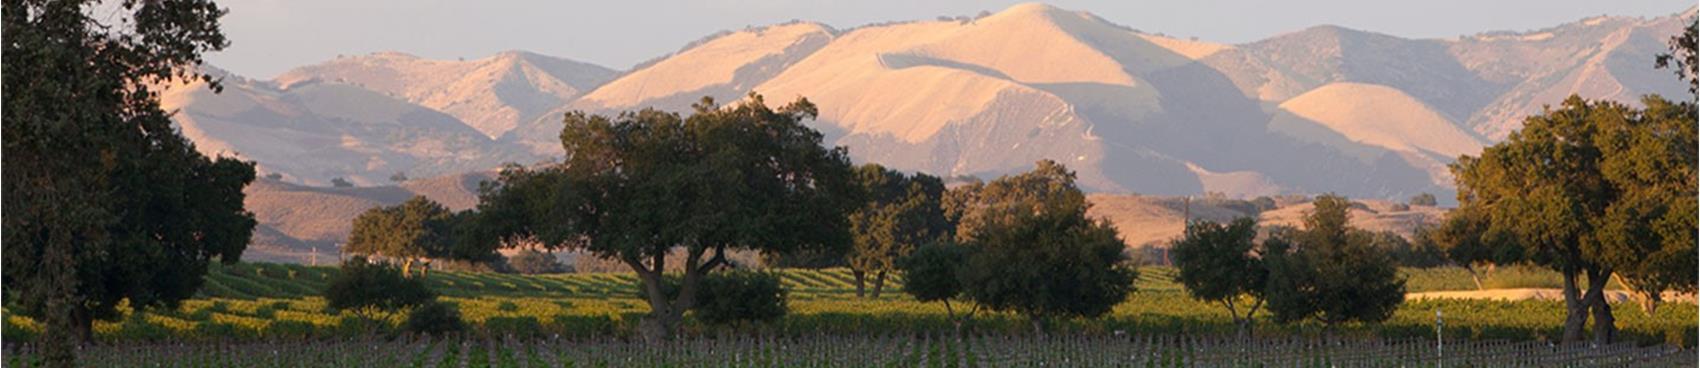 Firestone Vineyard & Winery